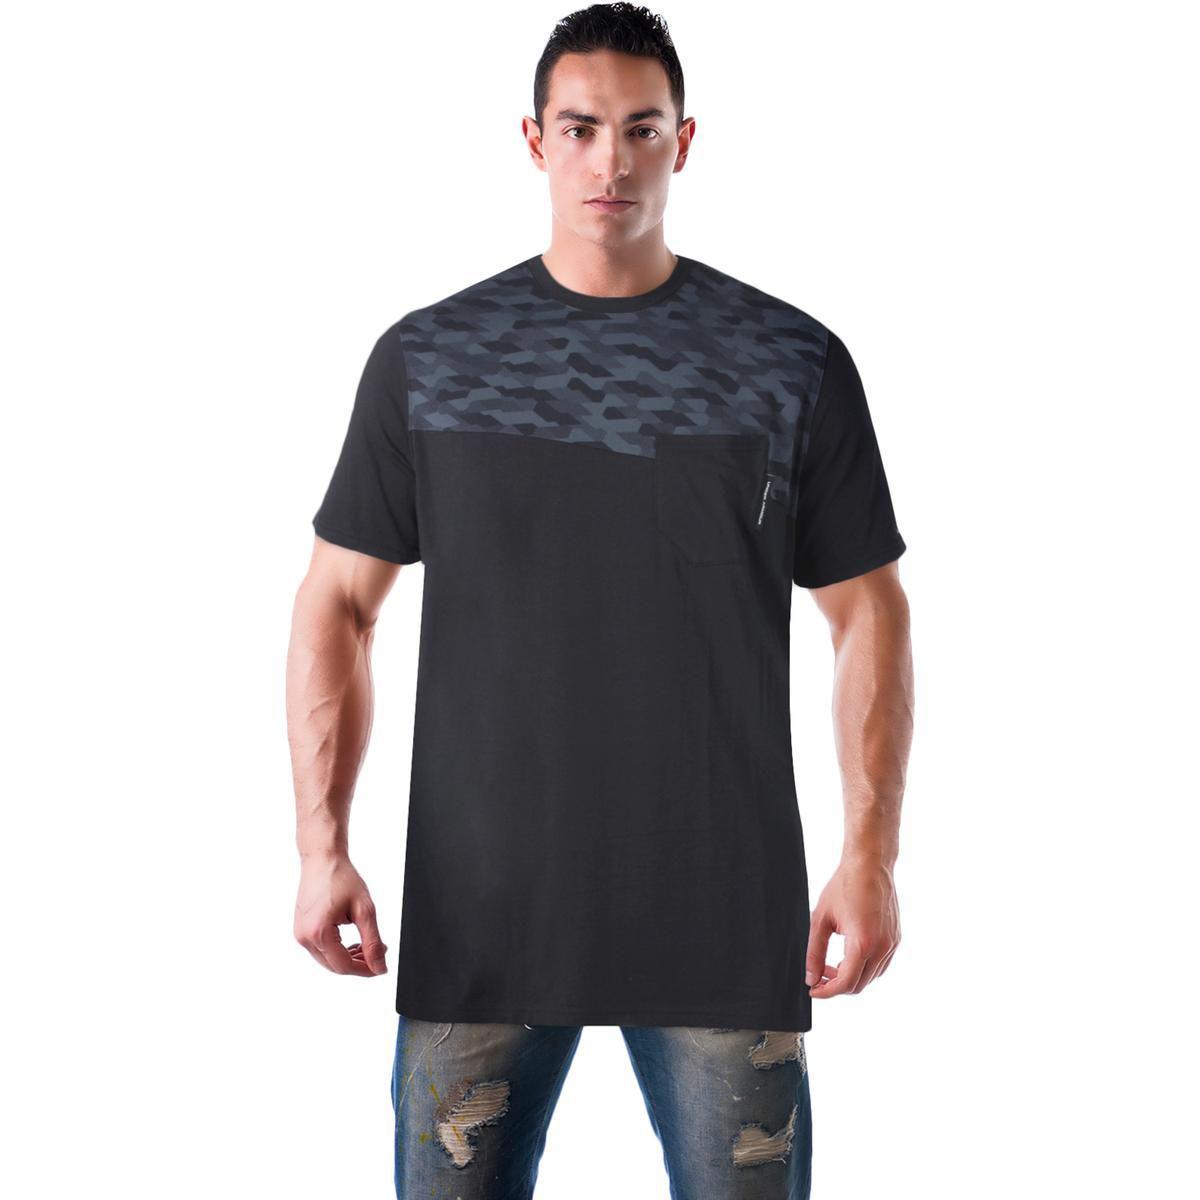 376f71a8 Under Armour. Black Mens Sc30 Essentials Pocket Stephen Curry Warriors T- shirt